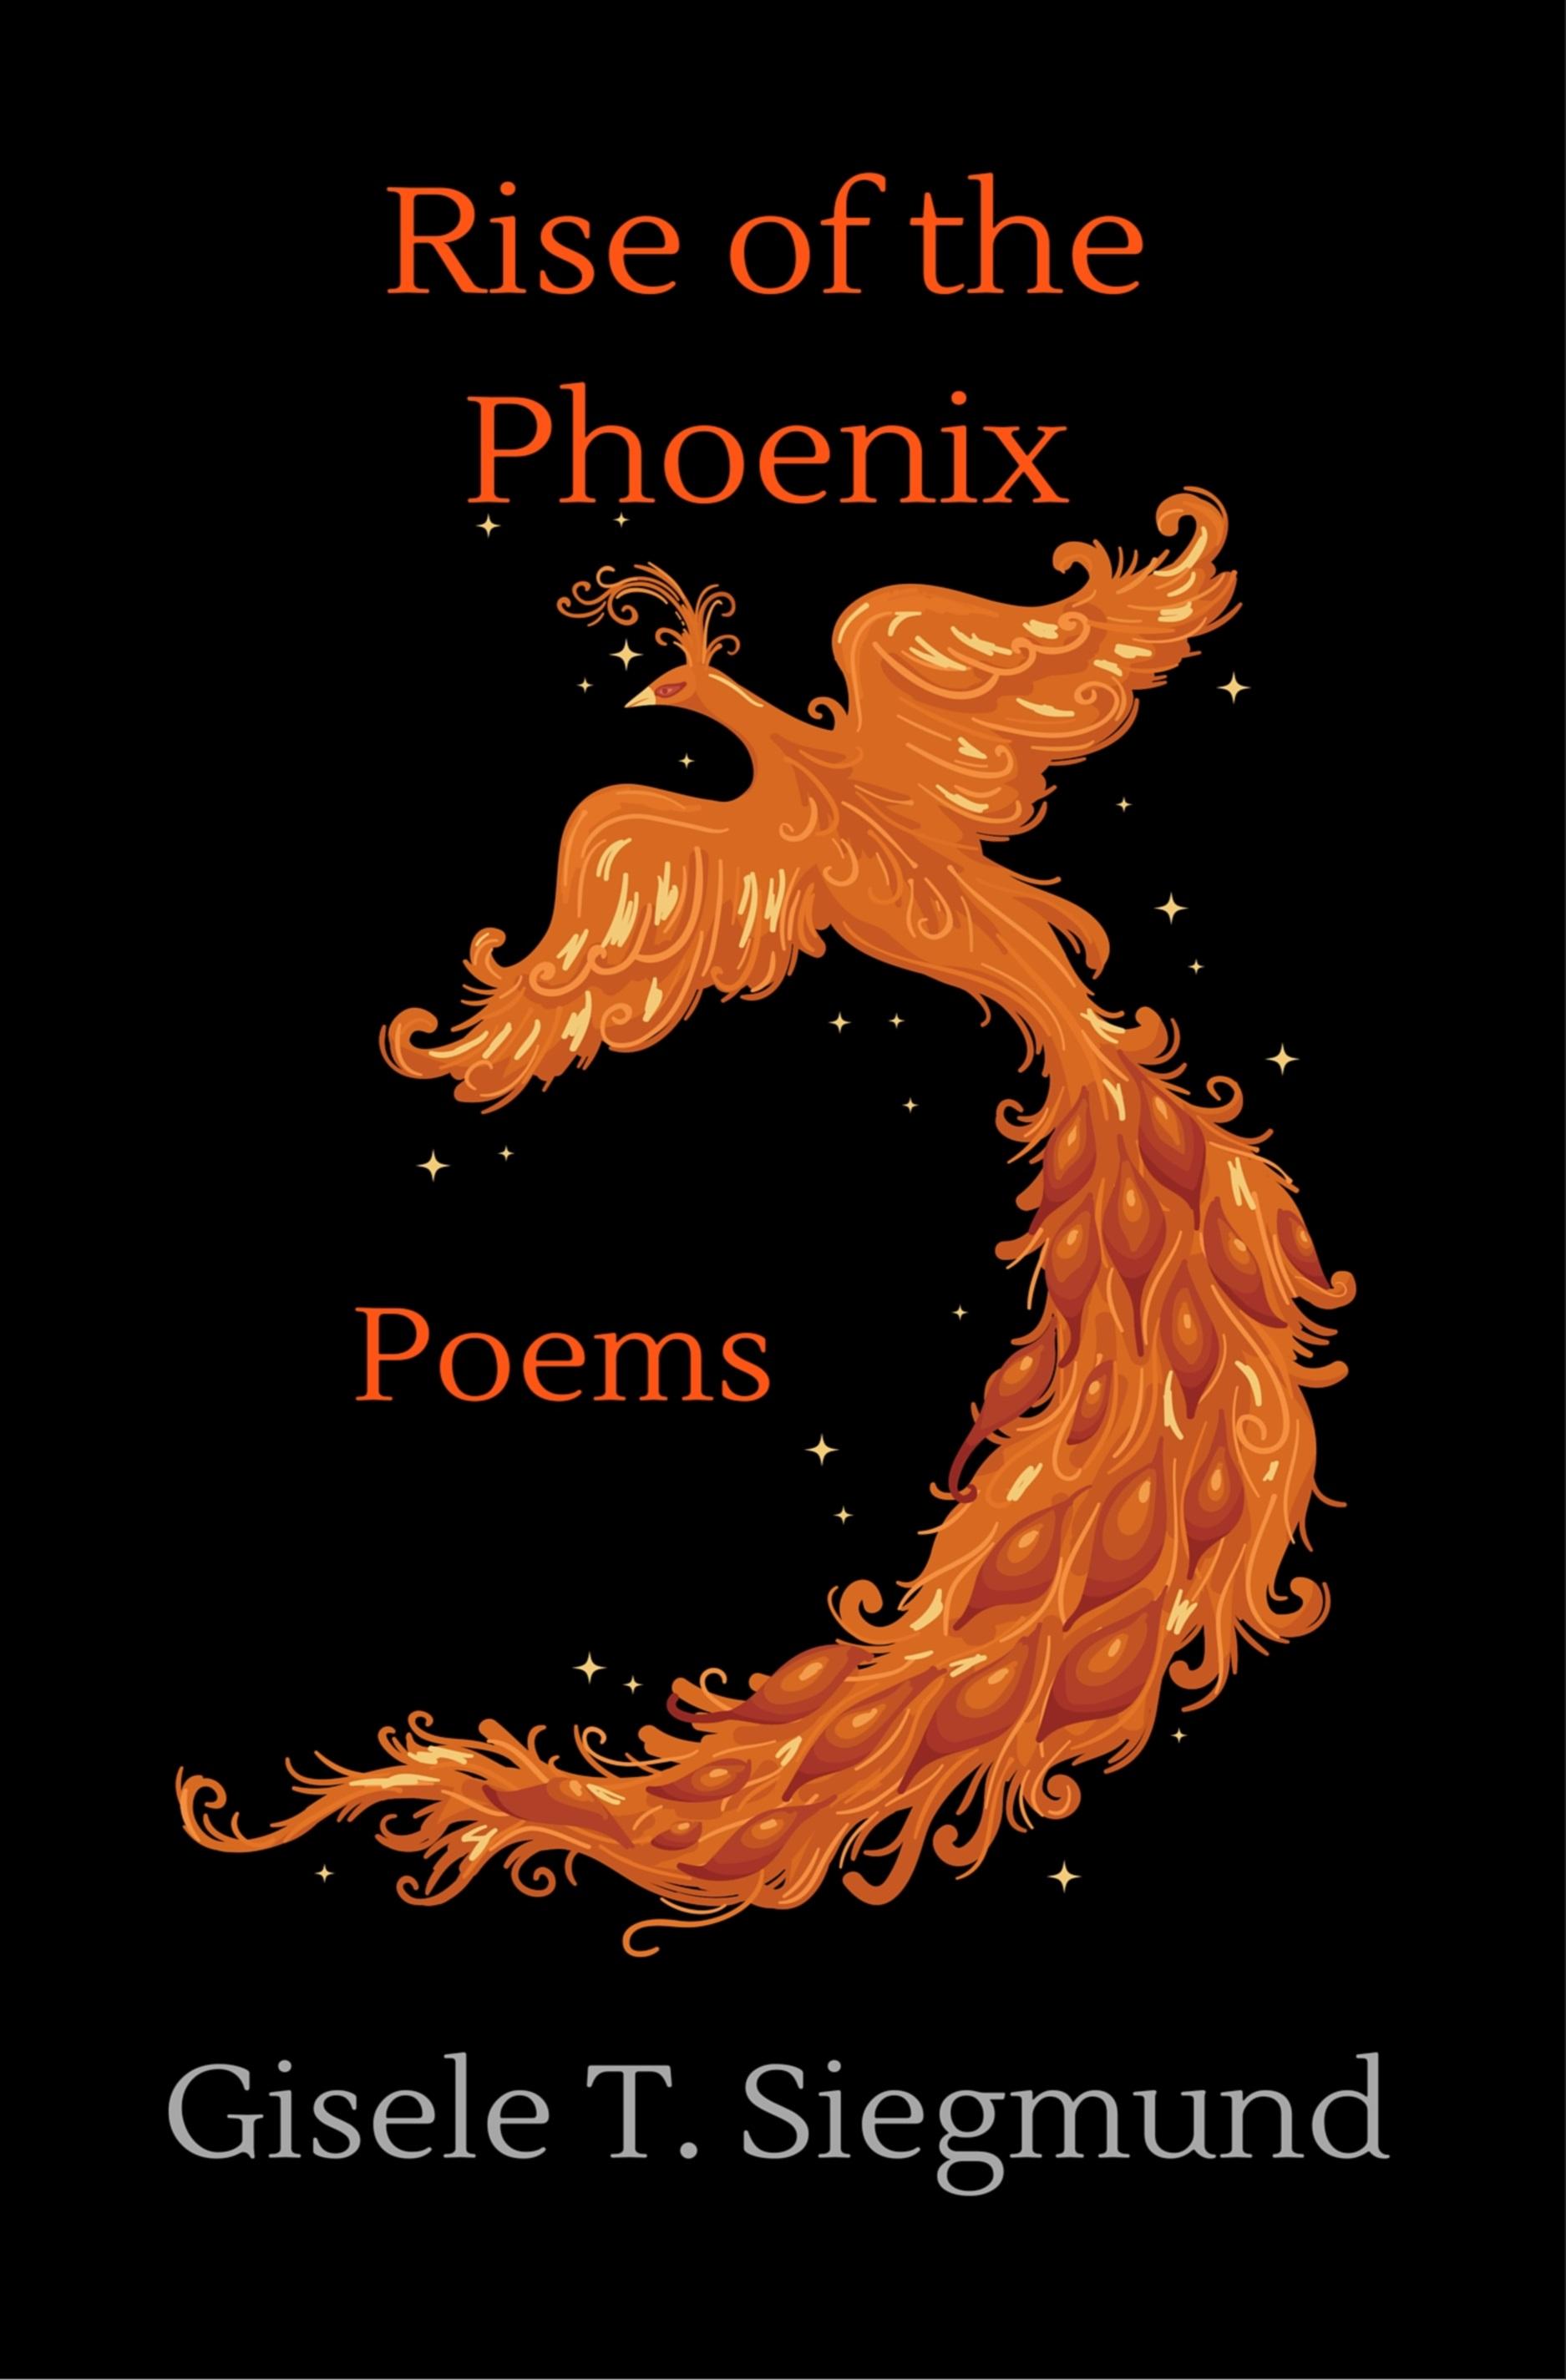 Phnix troubleshooting guide ebook array smashwords u2013 rise of the phoenix poems u2013 a book by gisele t siegmund fandeluxe Gallery